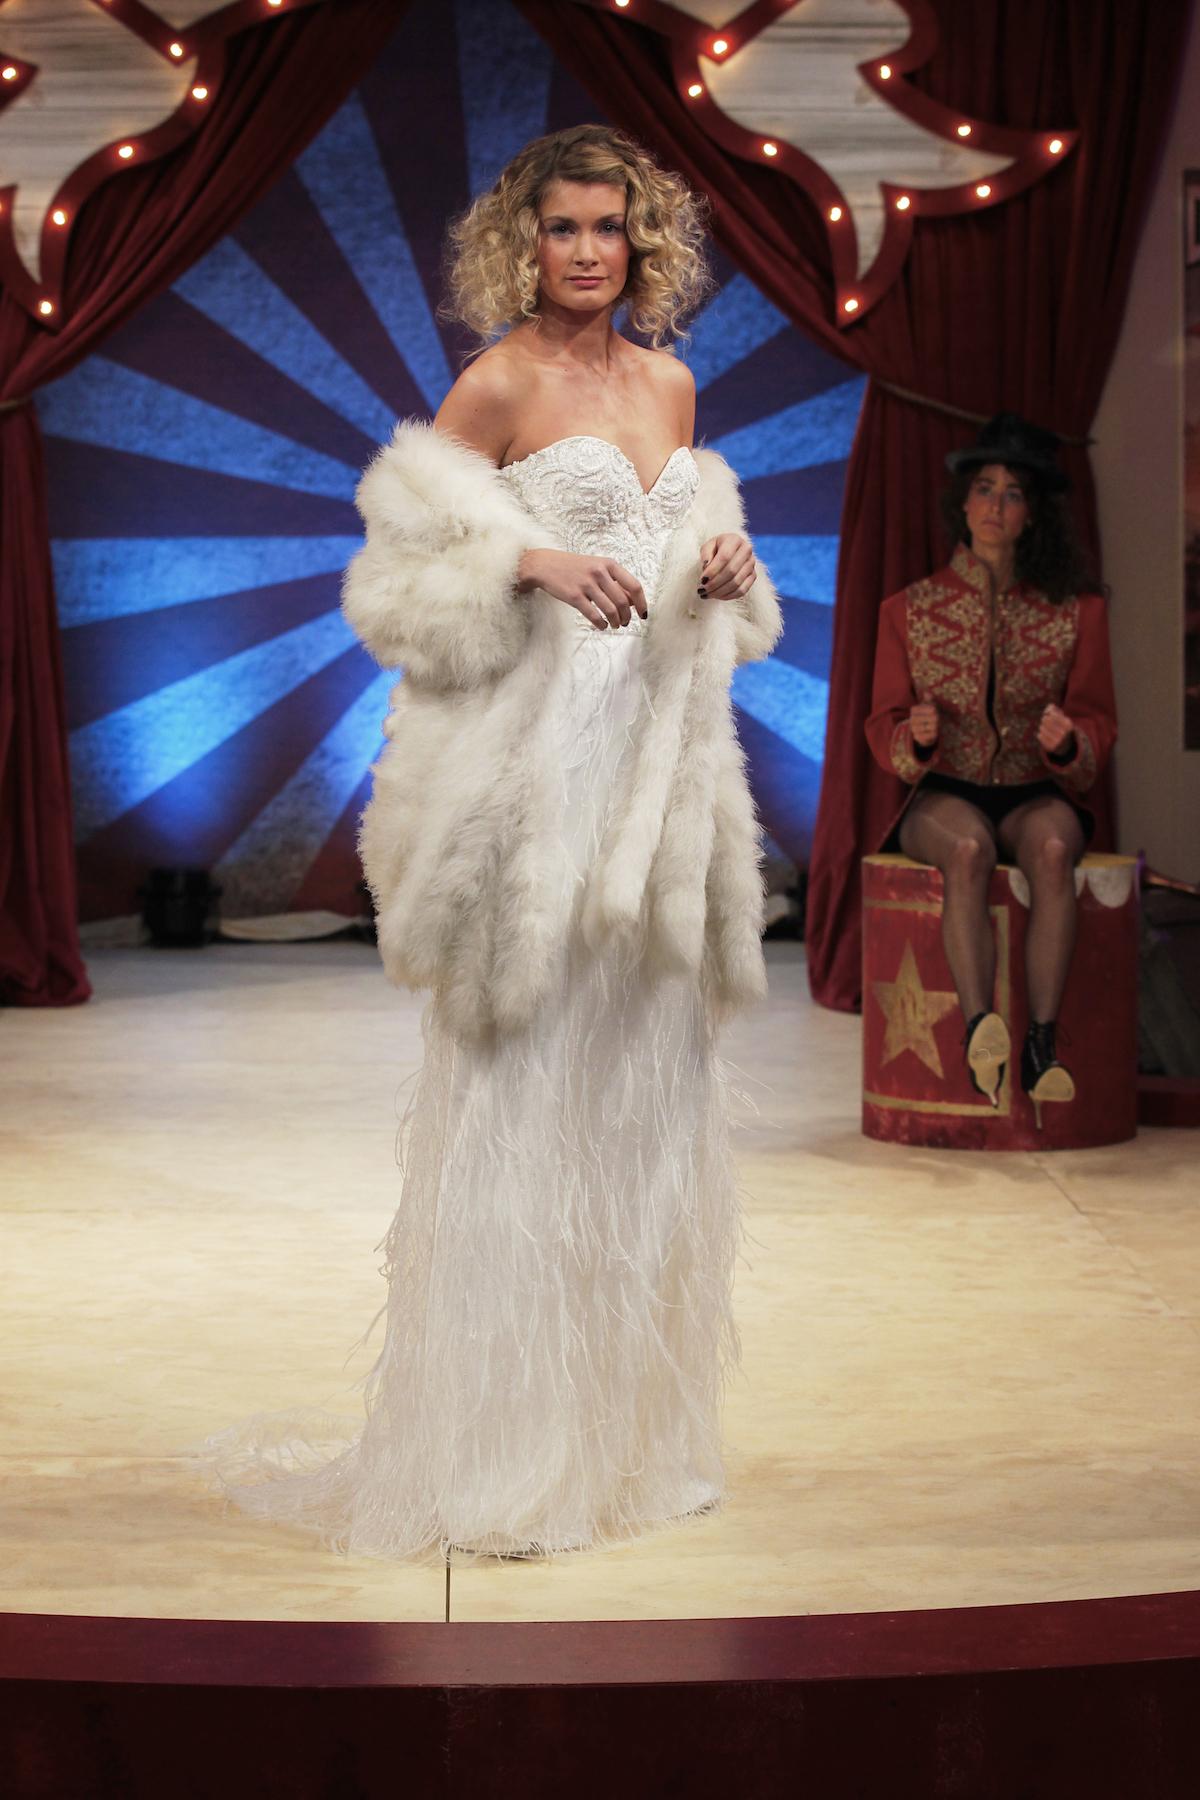 Dita beaded corset & Maribou skirt and jacket | Halfpenny London wedding dress on the Brides the Show catwalk